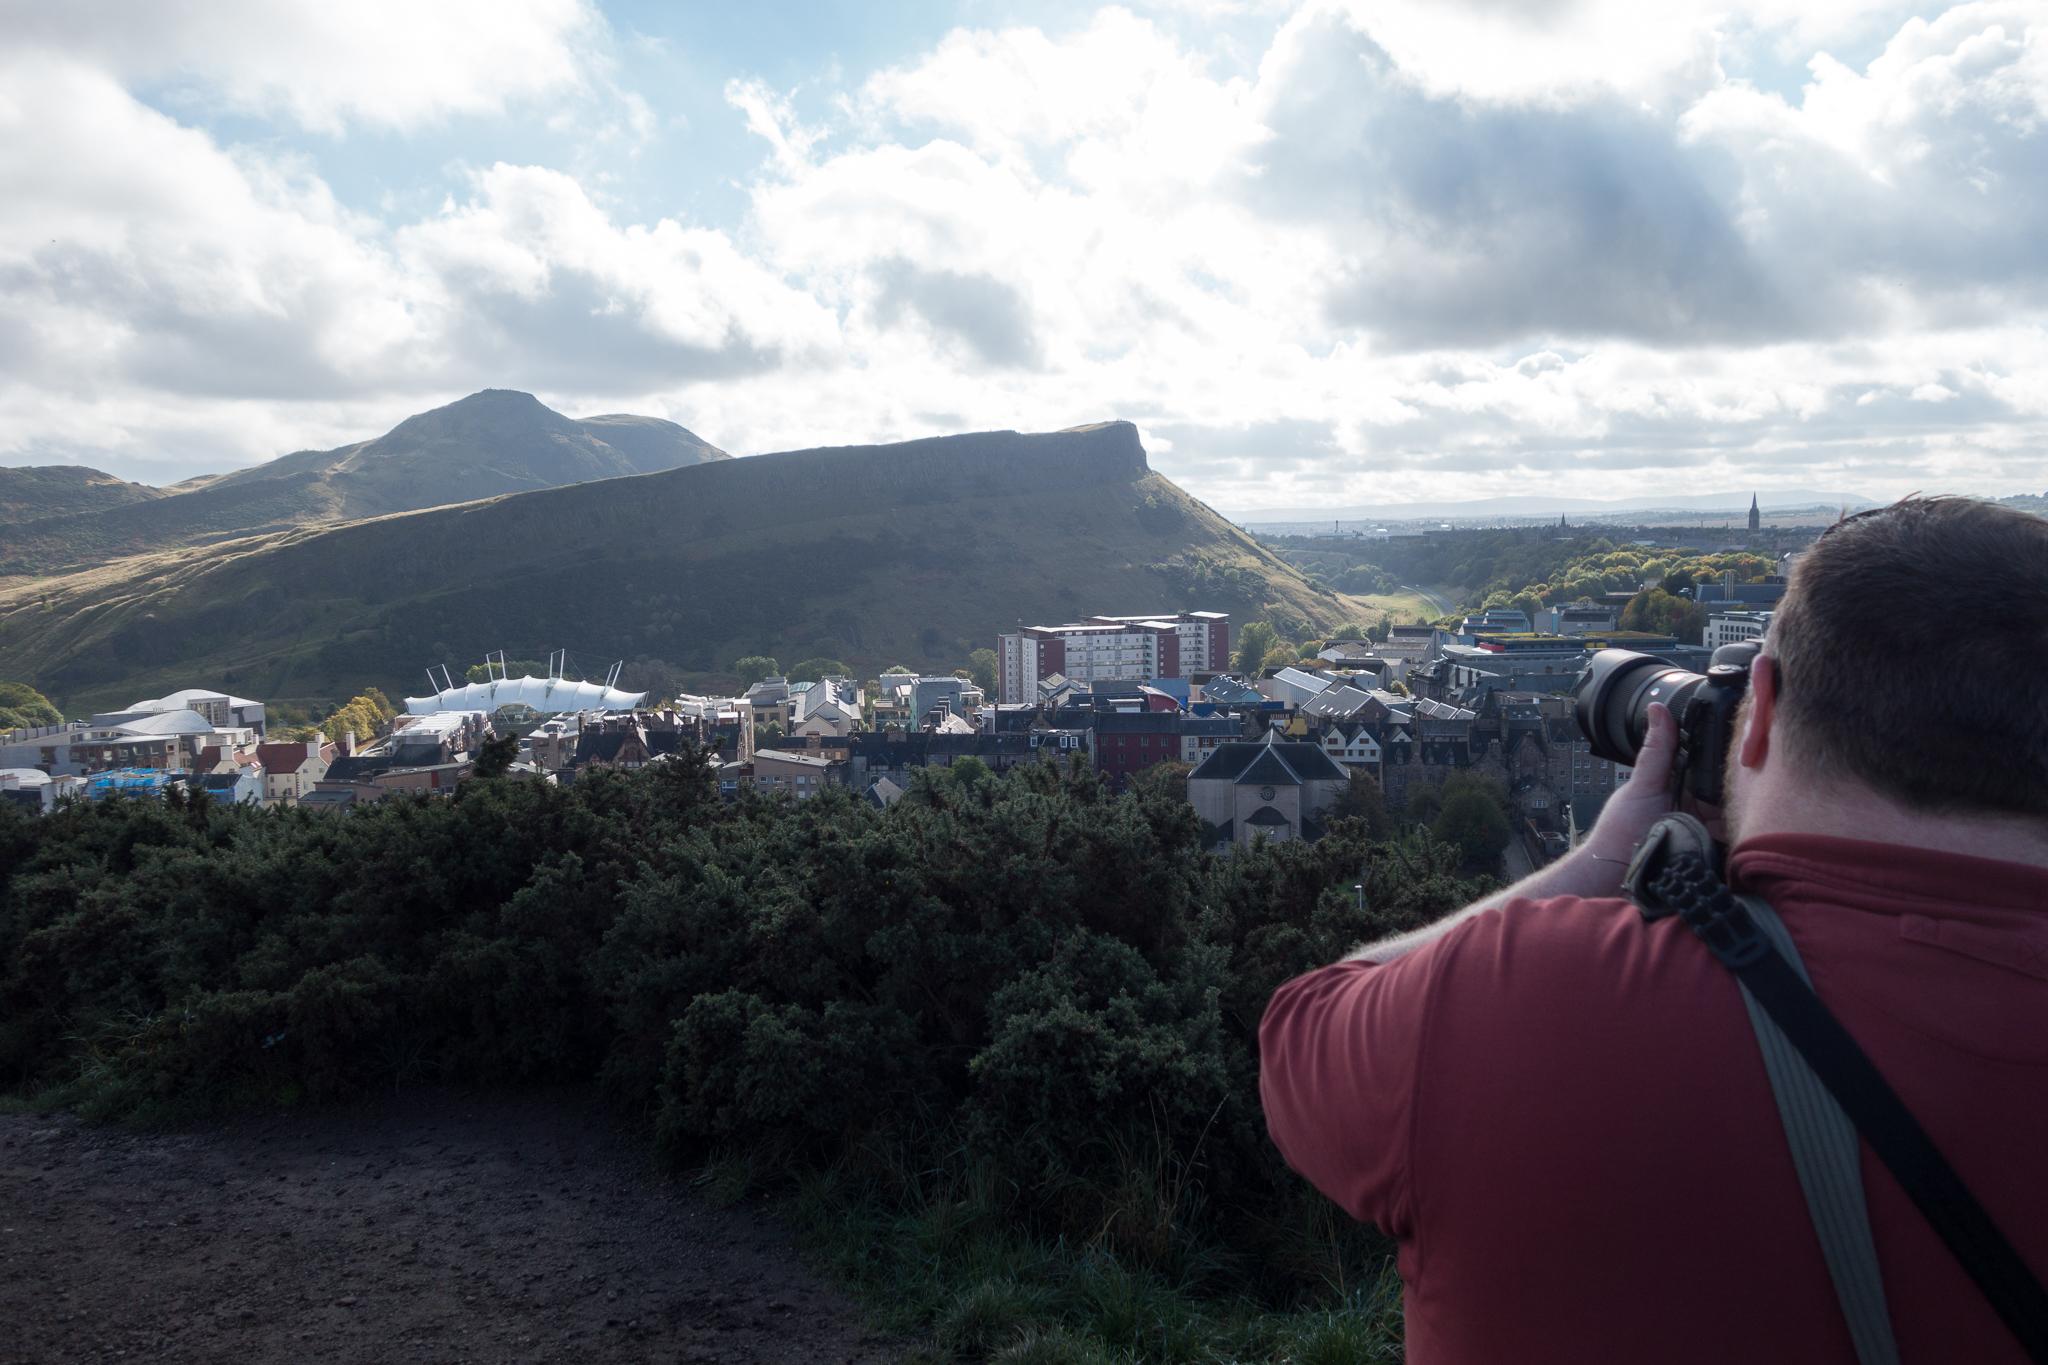 Brian taking a photo on Calton Hill in Edinburgh by Jess.